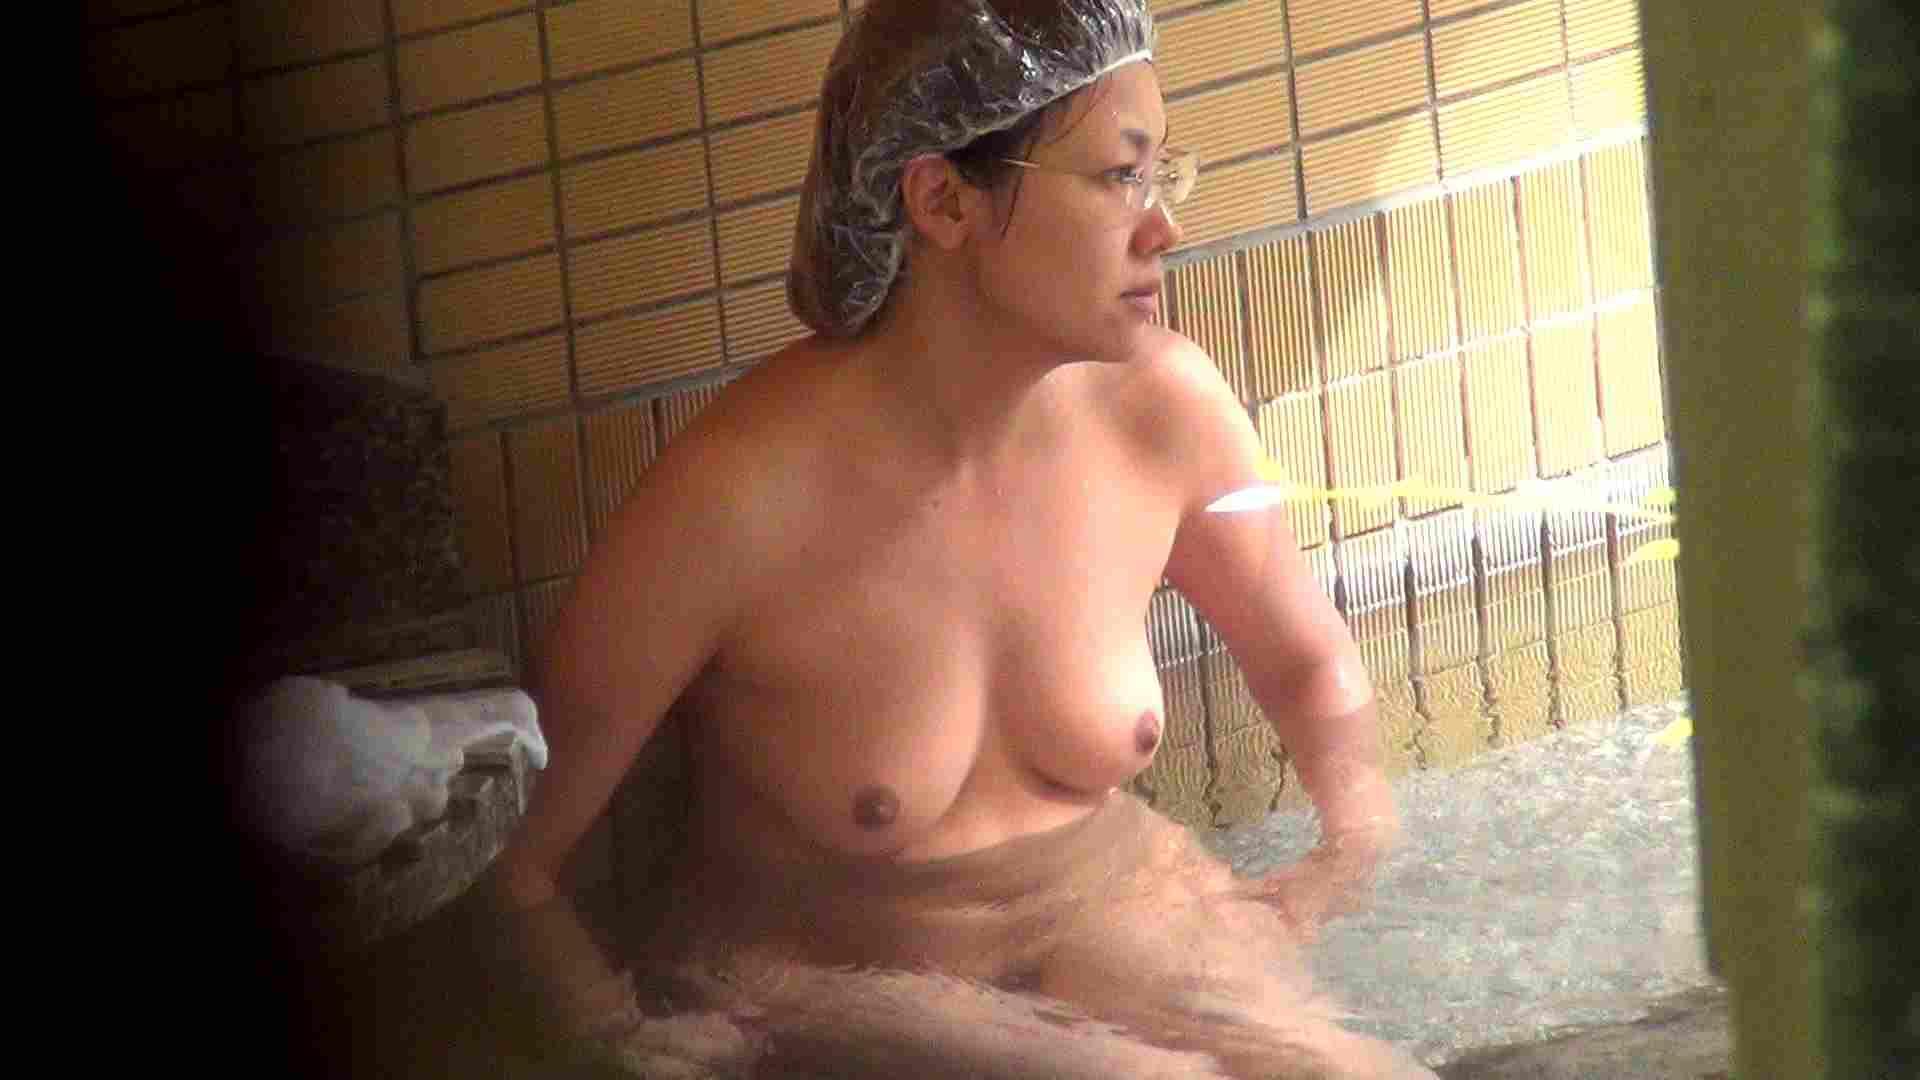 Aquaな露天風呂Vol.280 OLセックス  91画像 84